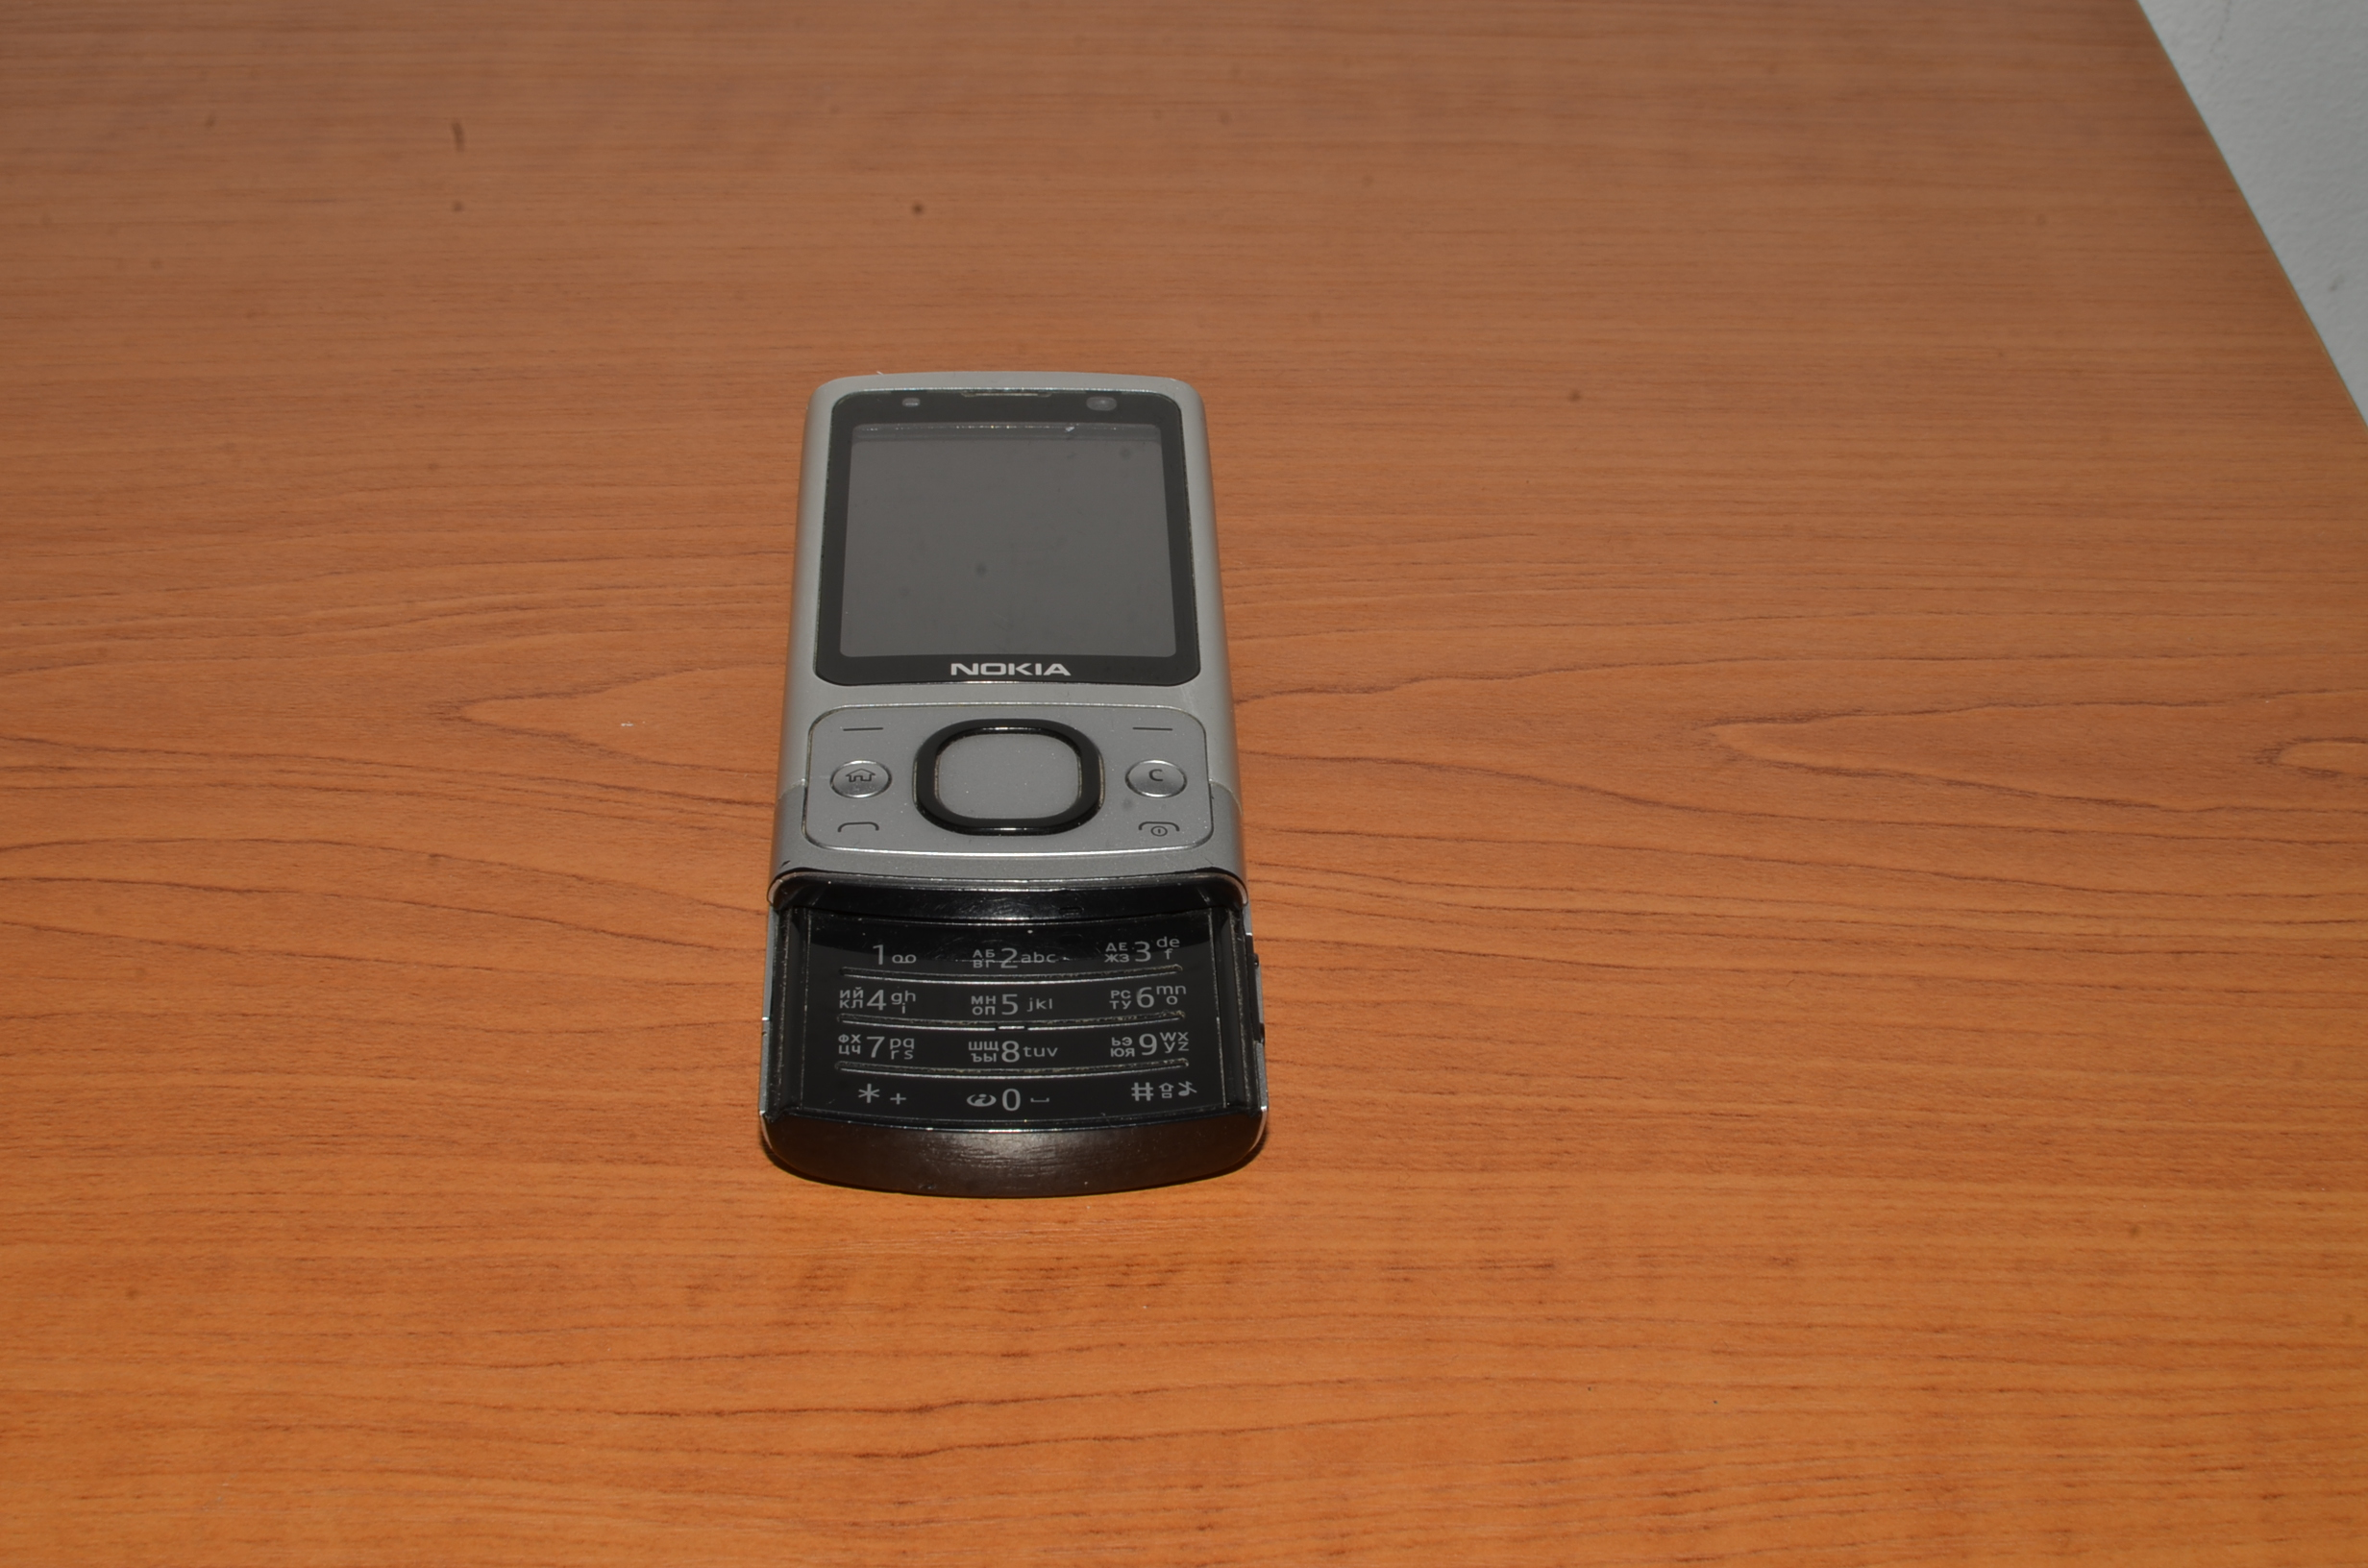 Nokia 6700 slide deals